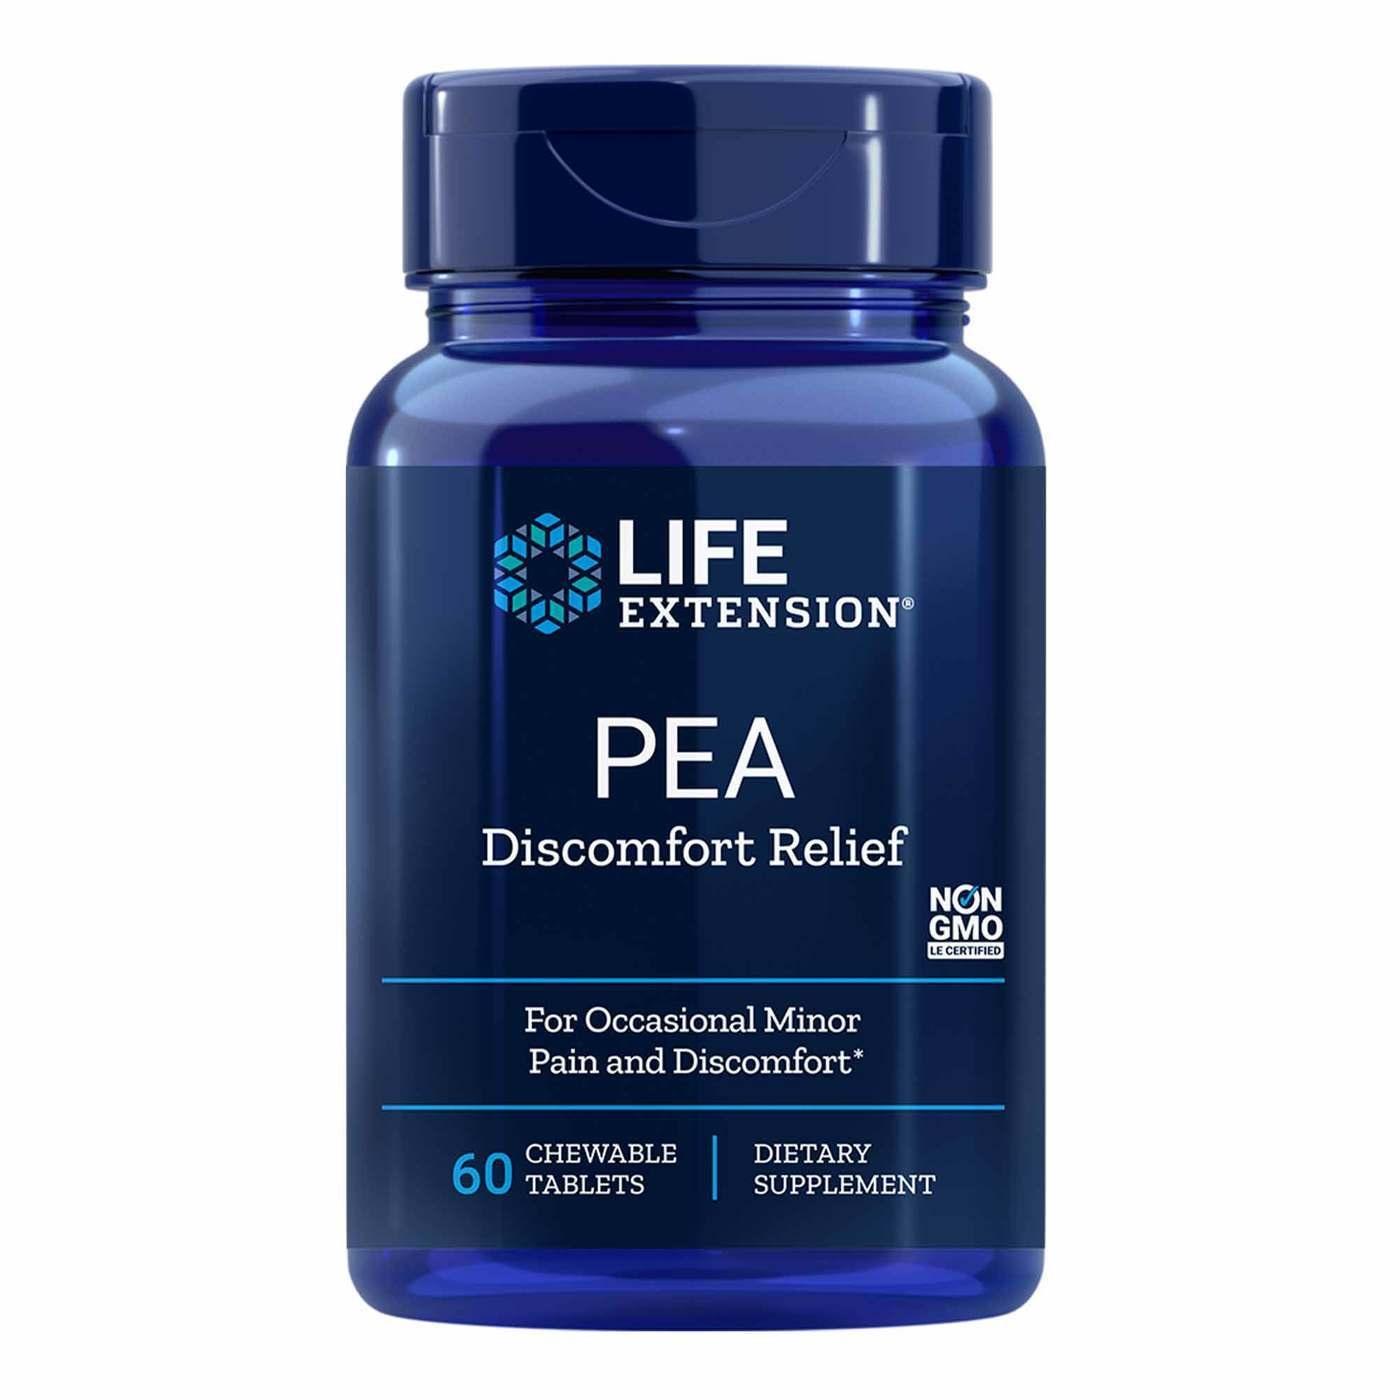 PEA - Alívio do Desconforto - Life Extension - 600mg (60 Tablets Mastigáveis)